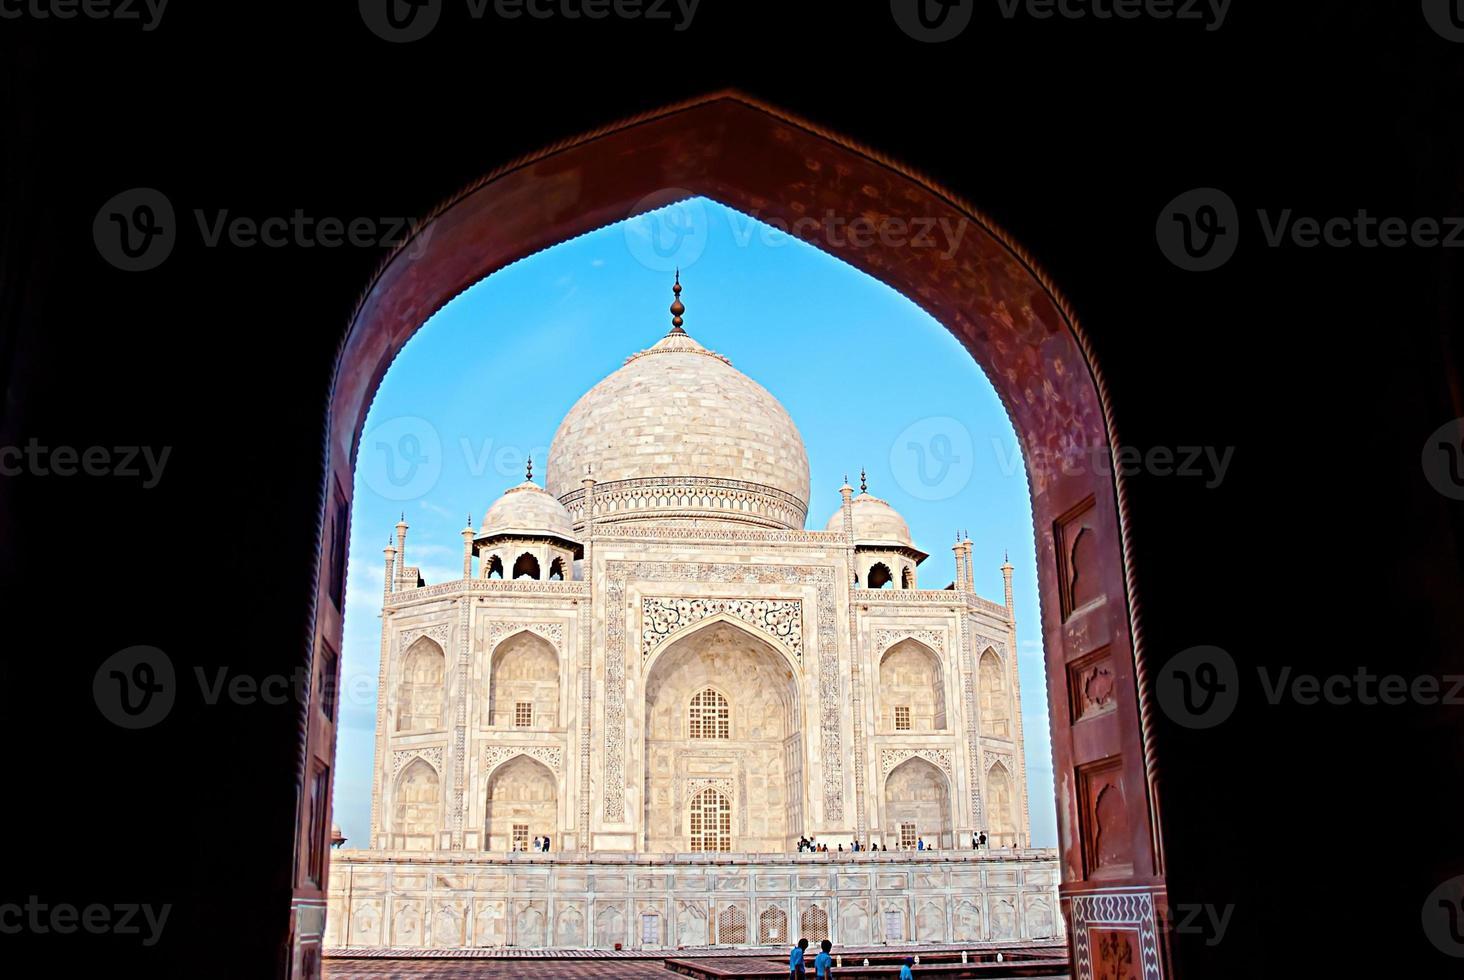 India. Taj Mahal. Islam architecture. Door to the mosque photo